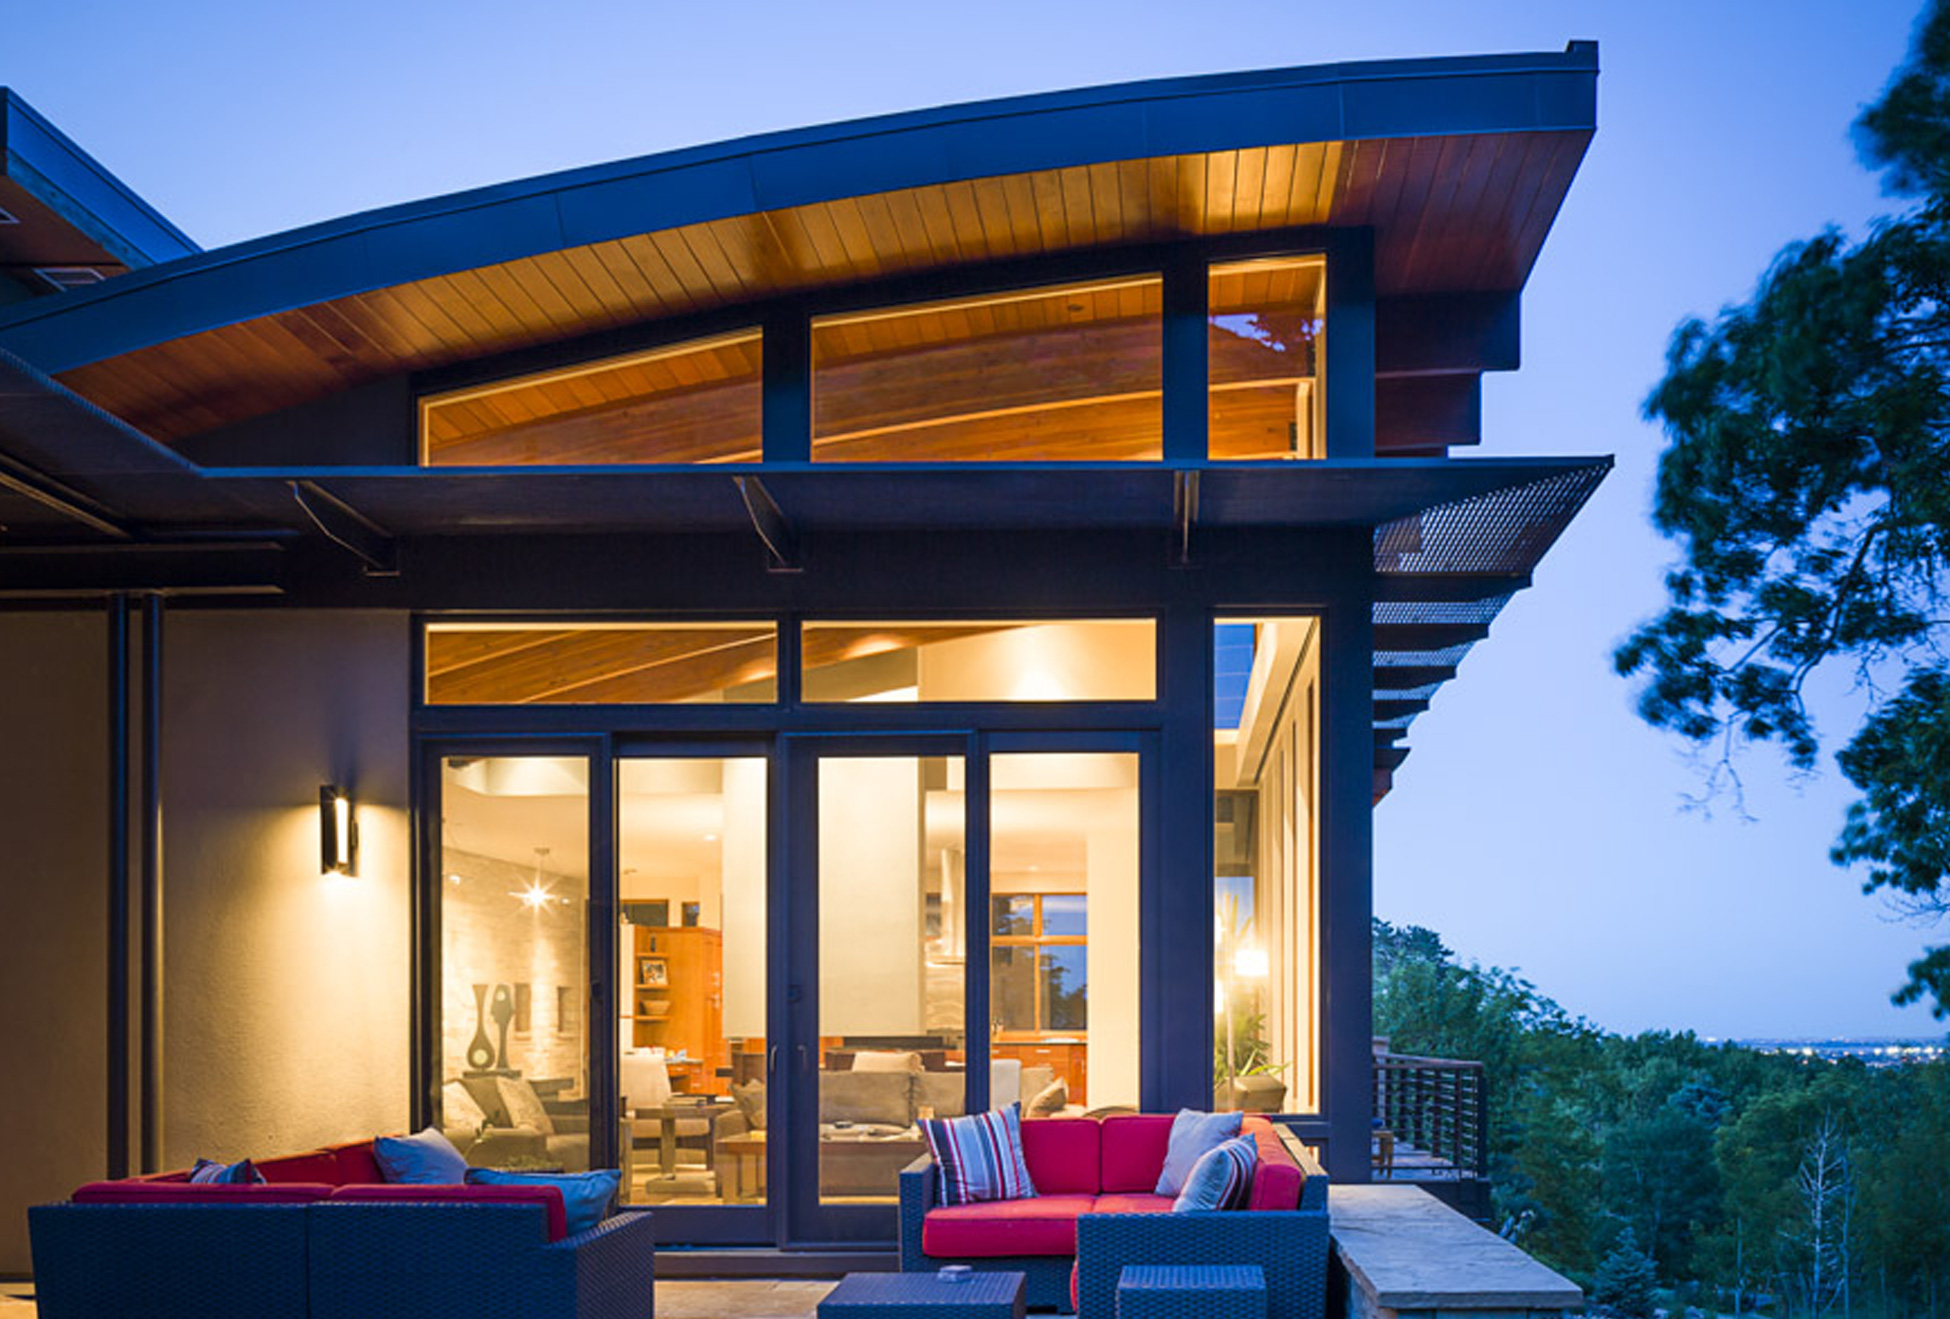 Colorado Modern Home